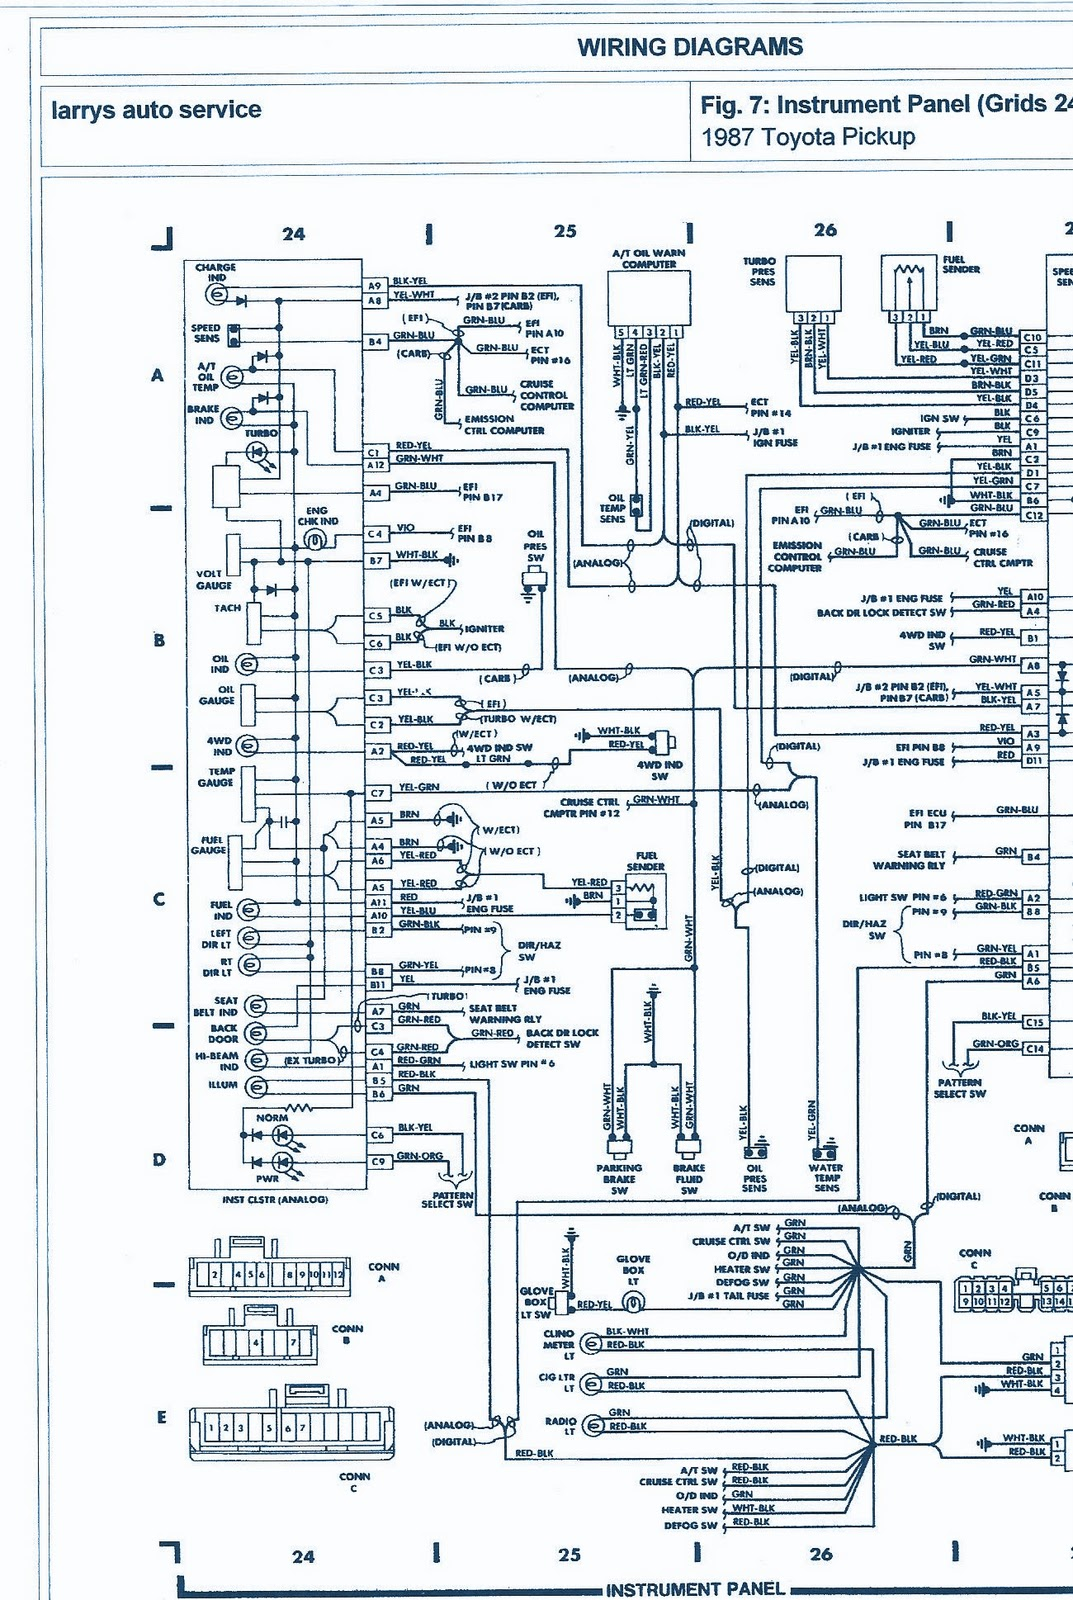 49cc Engine Wiring Diagram Detailed Schematics Bicycle Performance Parts Mini Gas Pocket Bikes